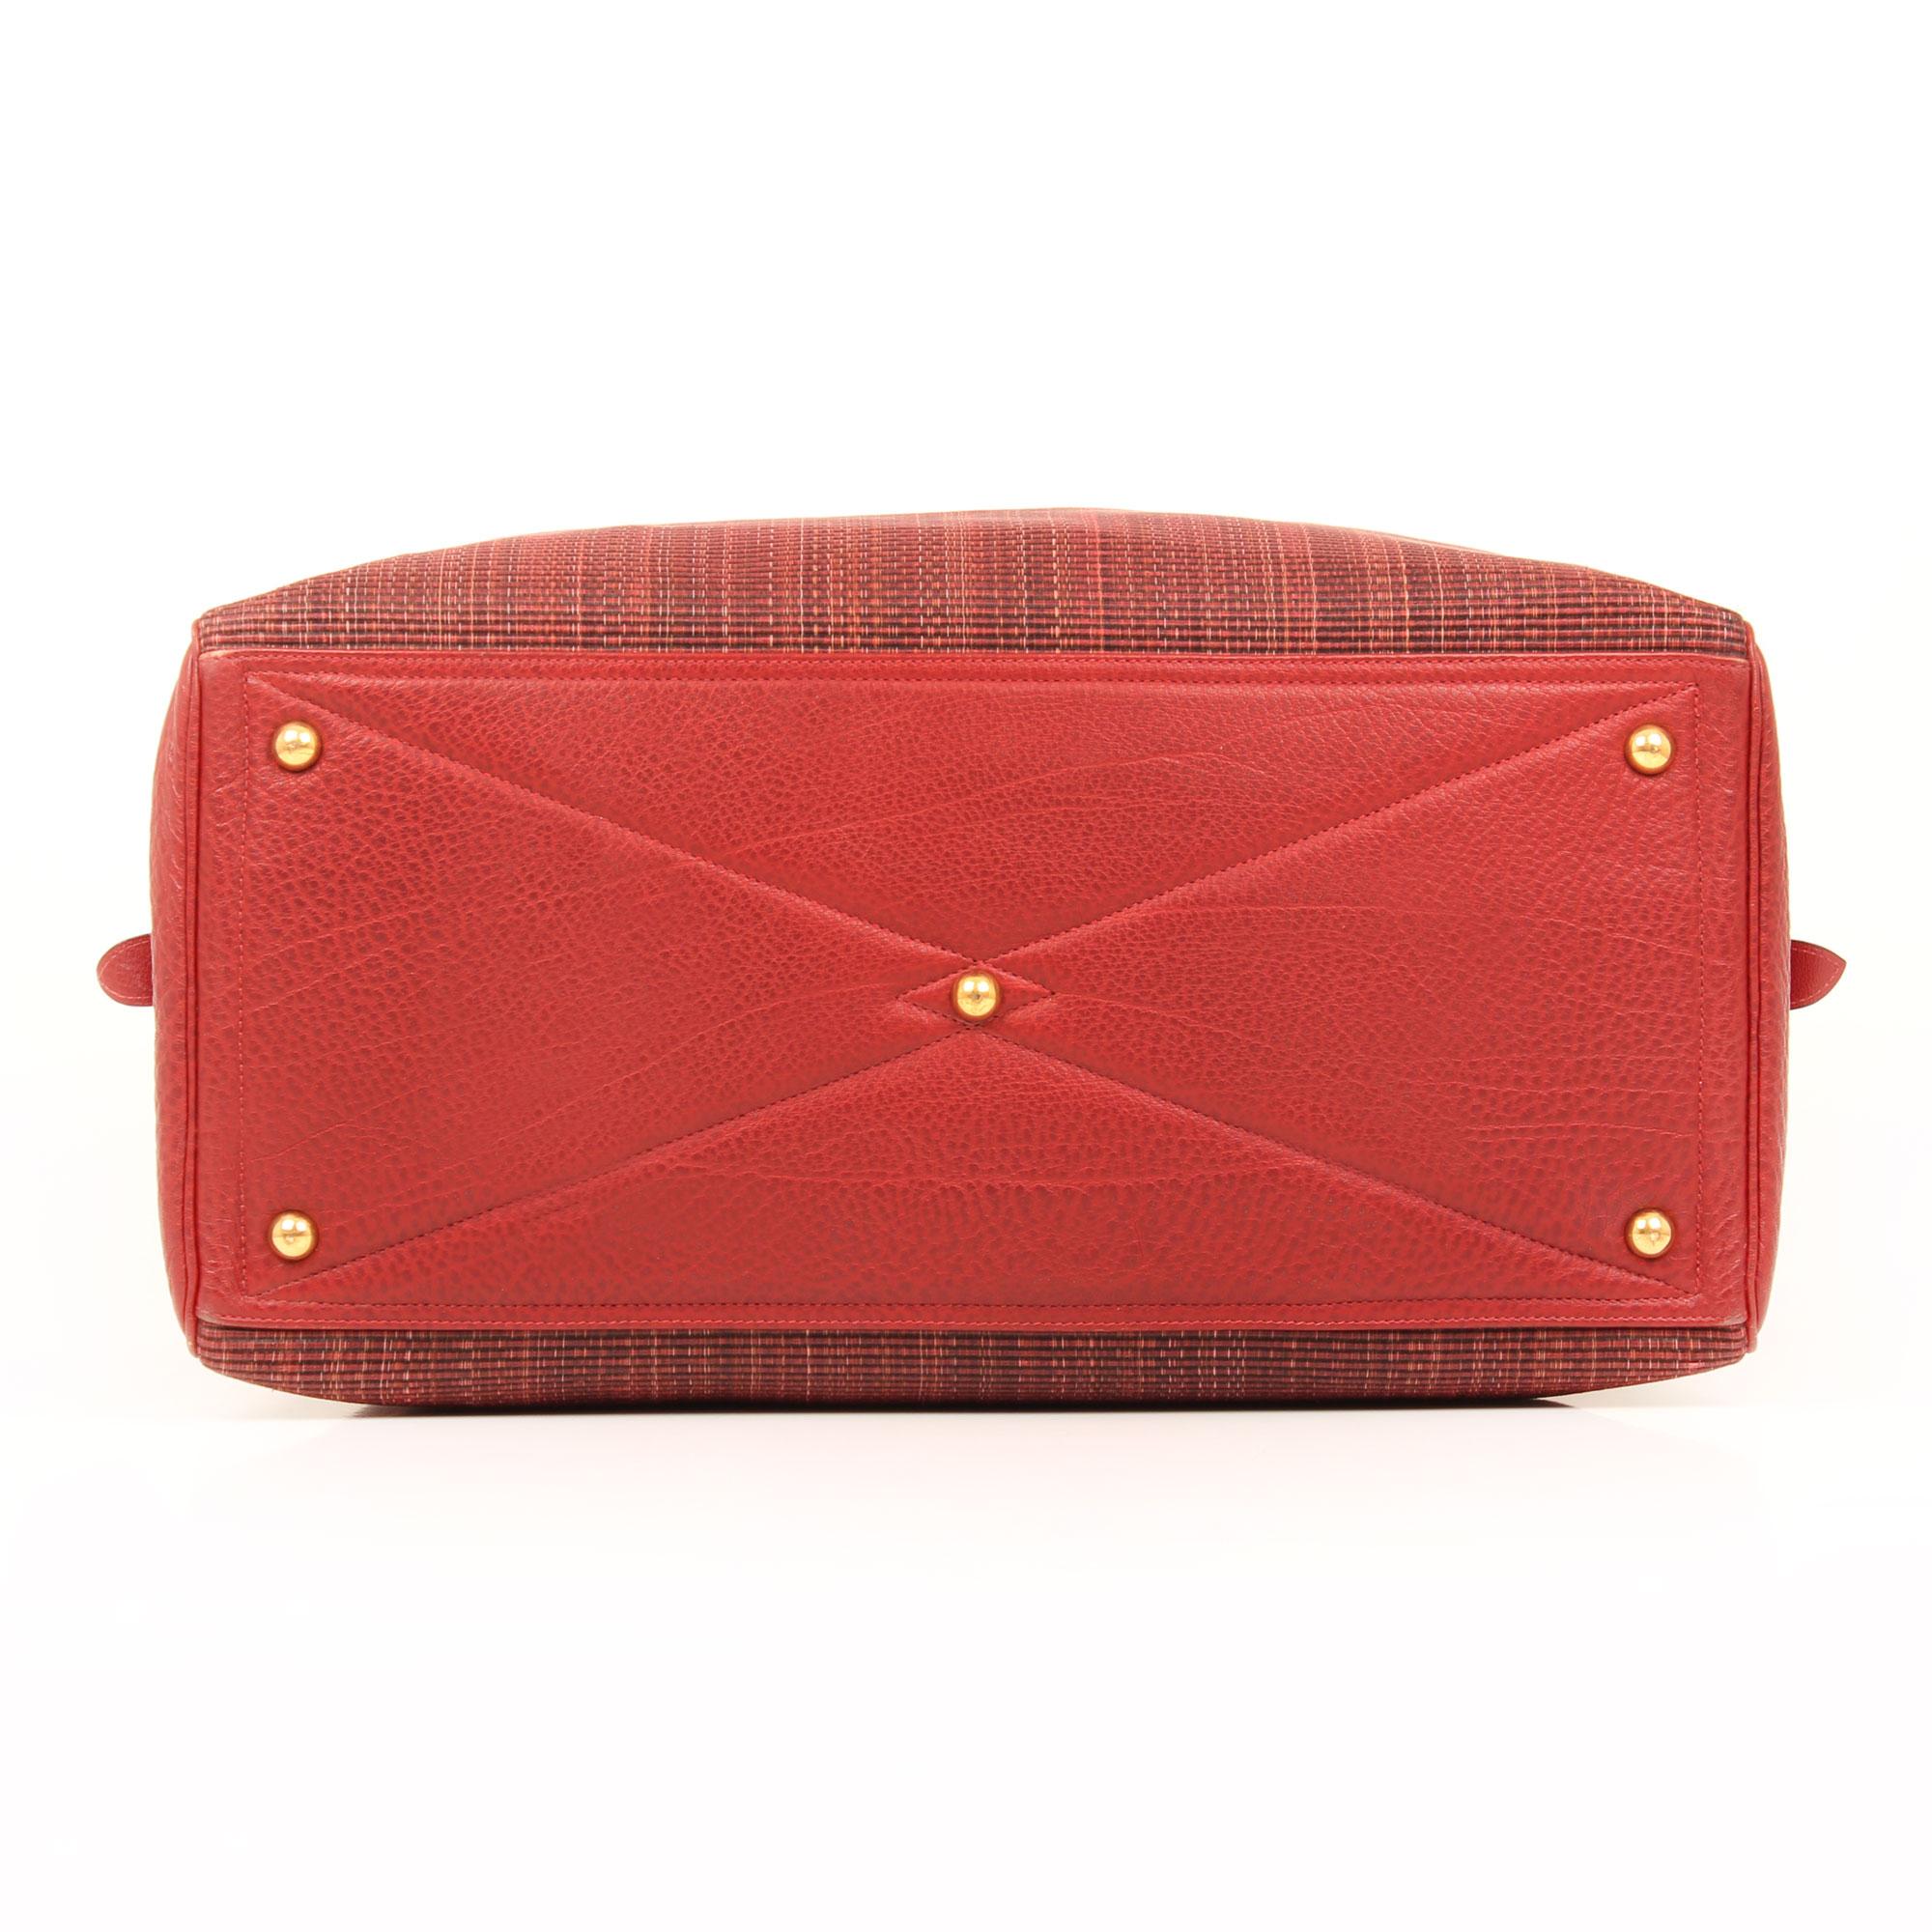 bolsa de viaje victoria II piel de bufalo crinolina rouge base